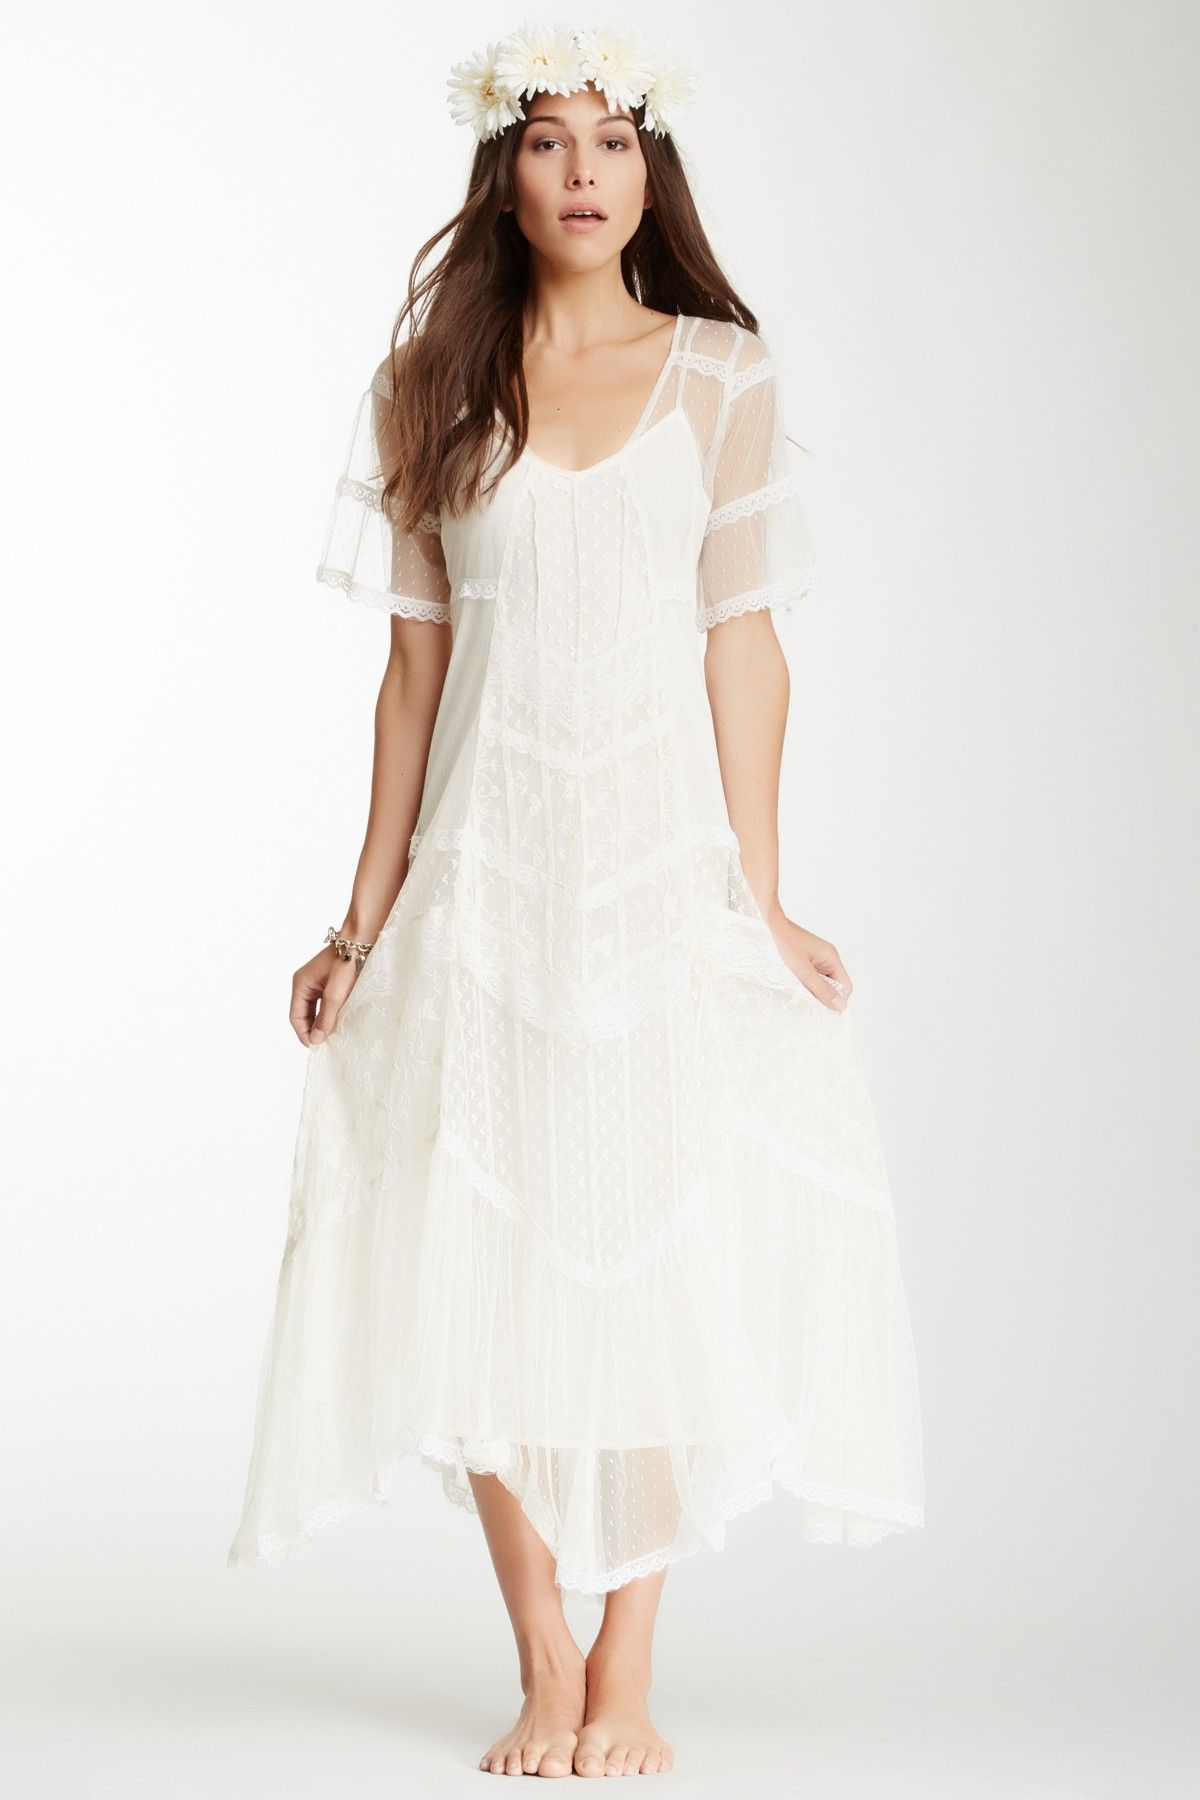 Crisp dotted mesh elson dress asap pinterest dresses wedding